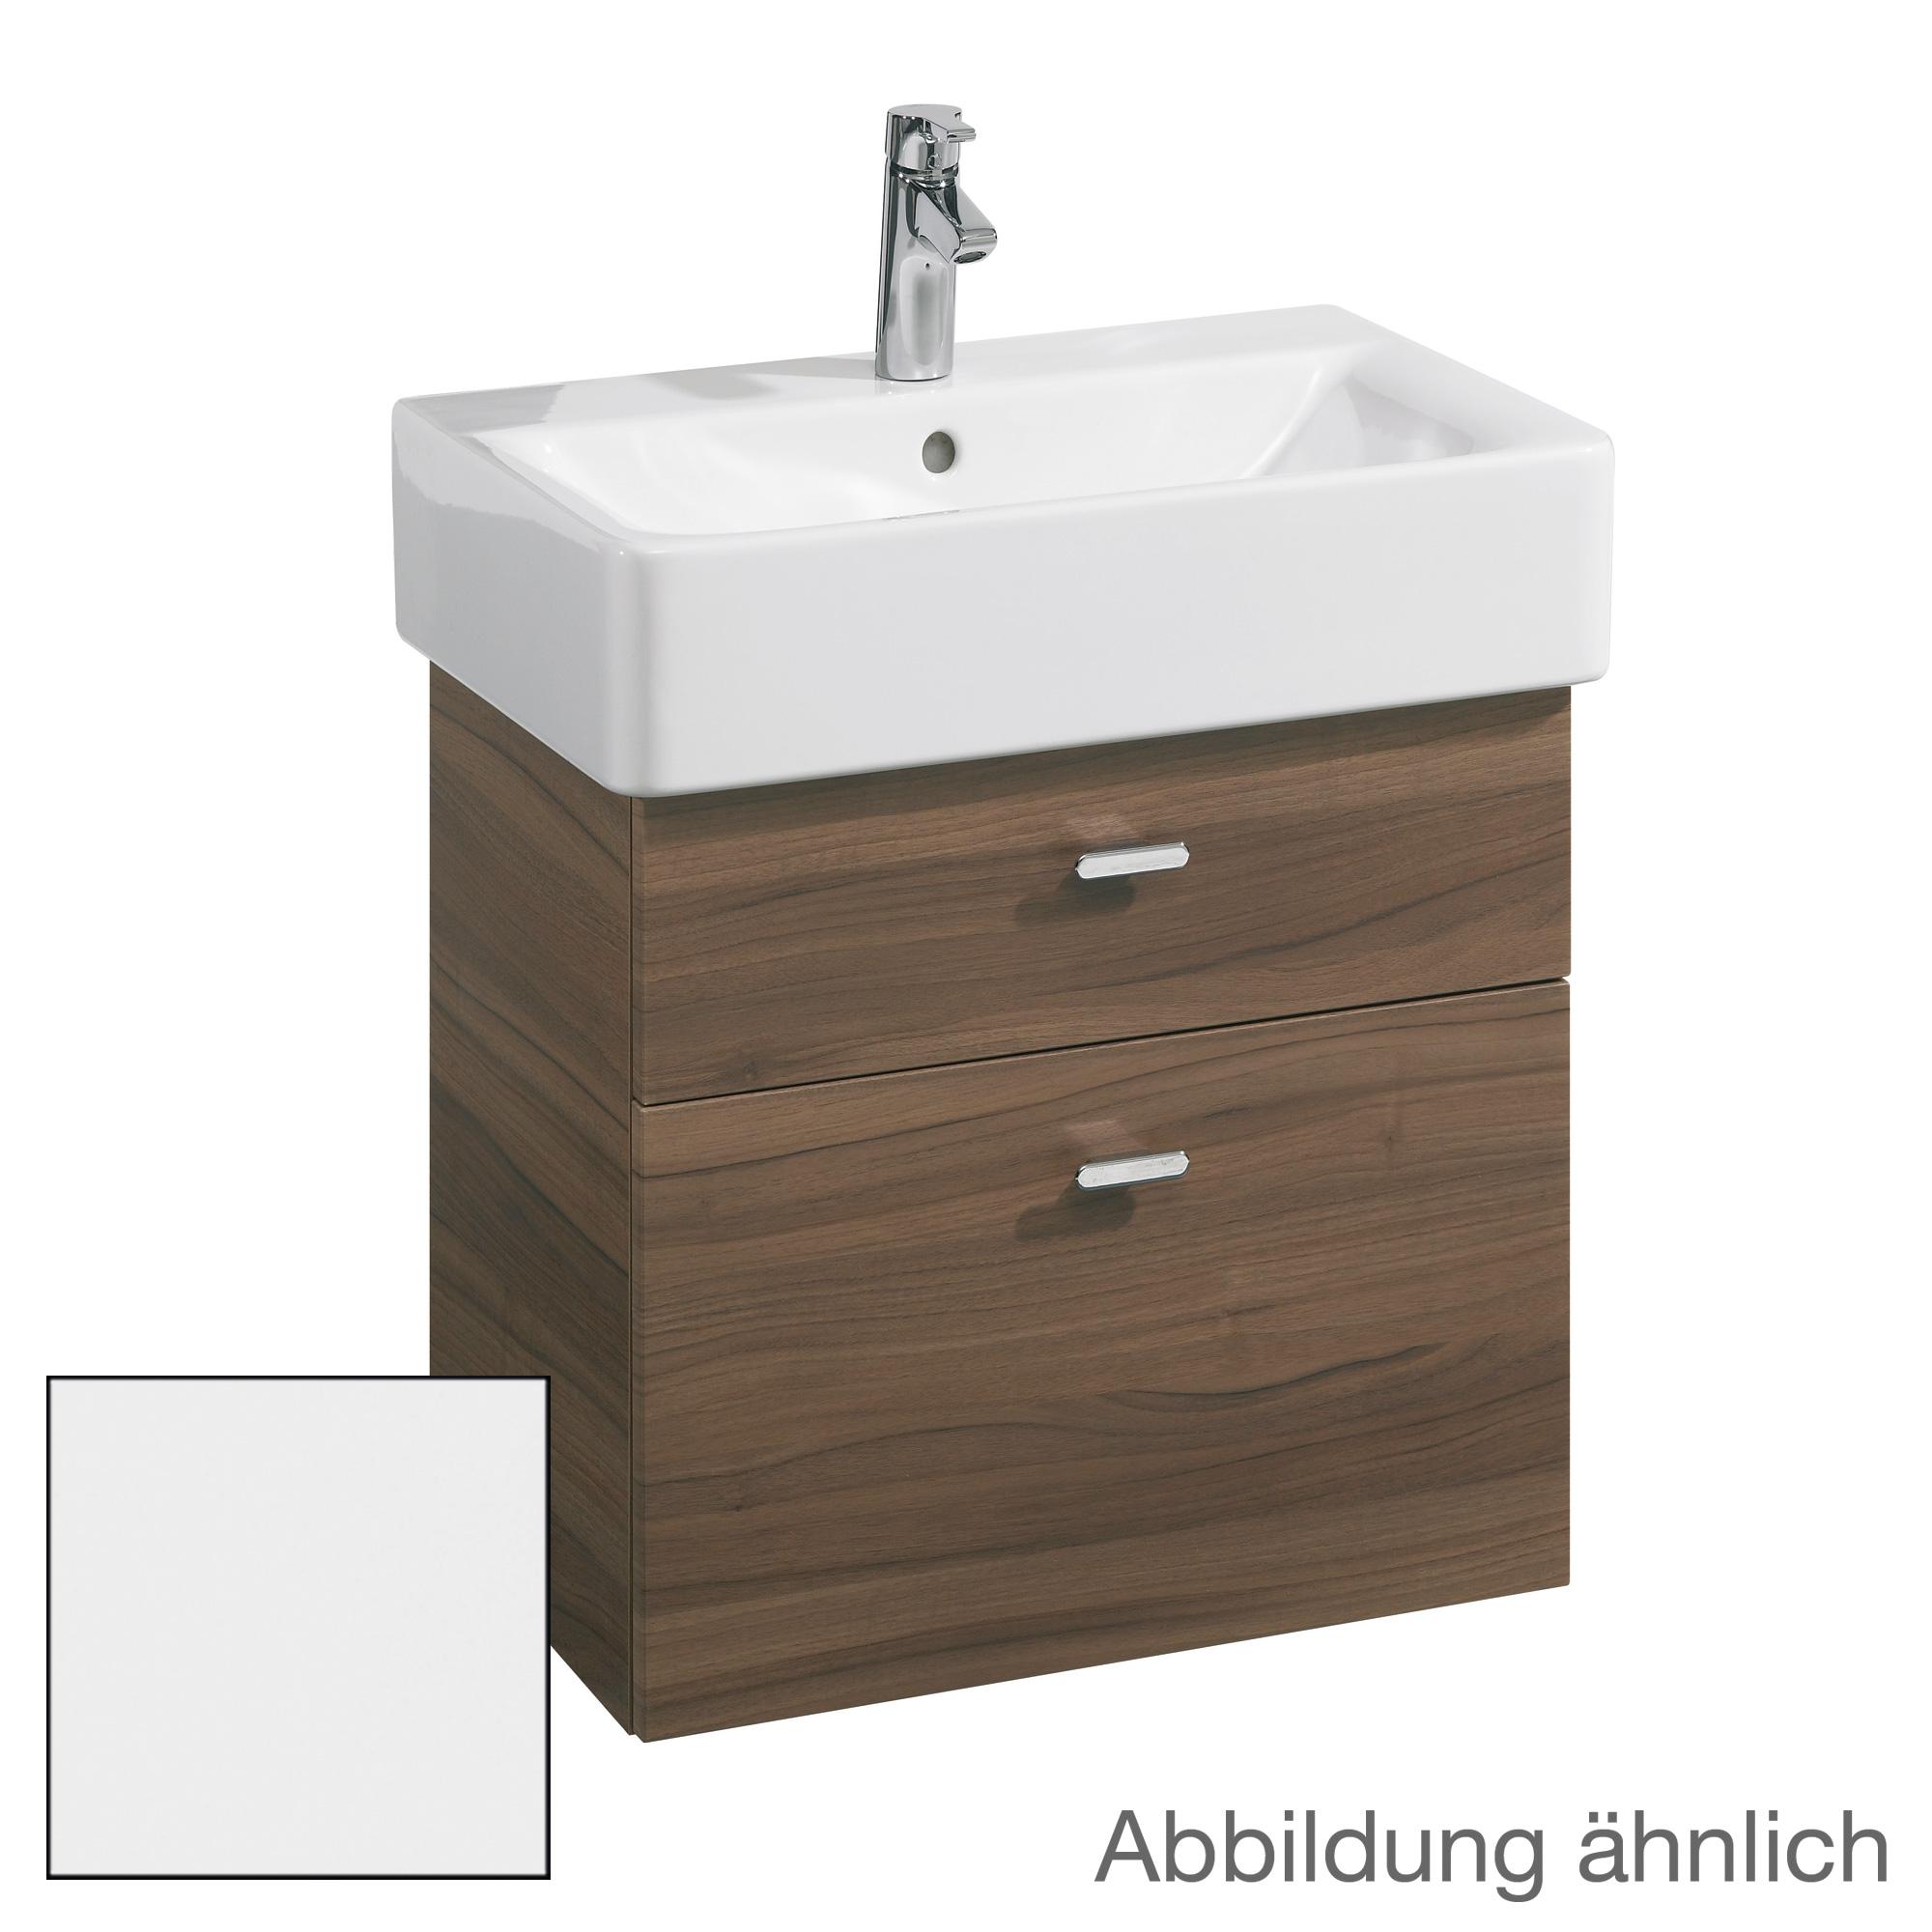 villeroy boch badezimmermbel badezimmer waschbecken set. Black Bedroom Furniture Sets. Home Design Ideas